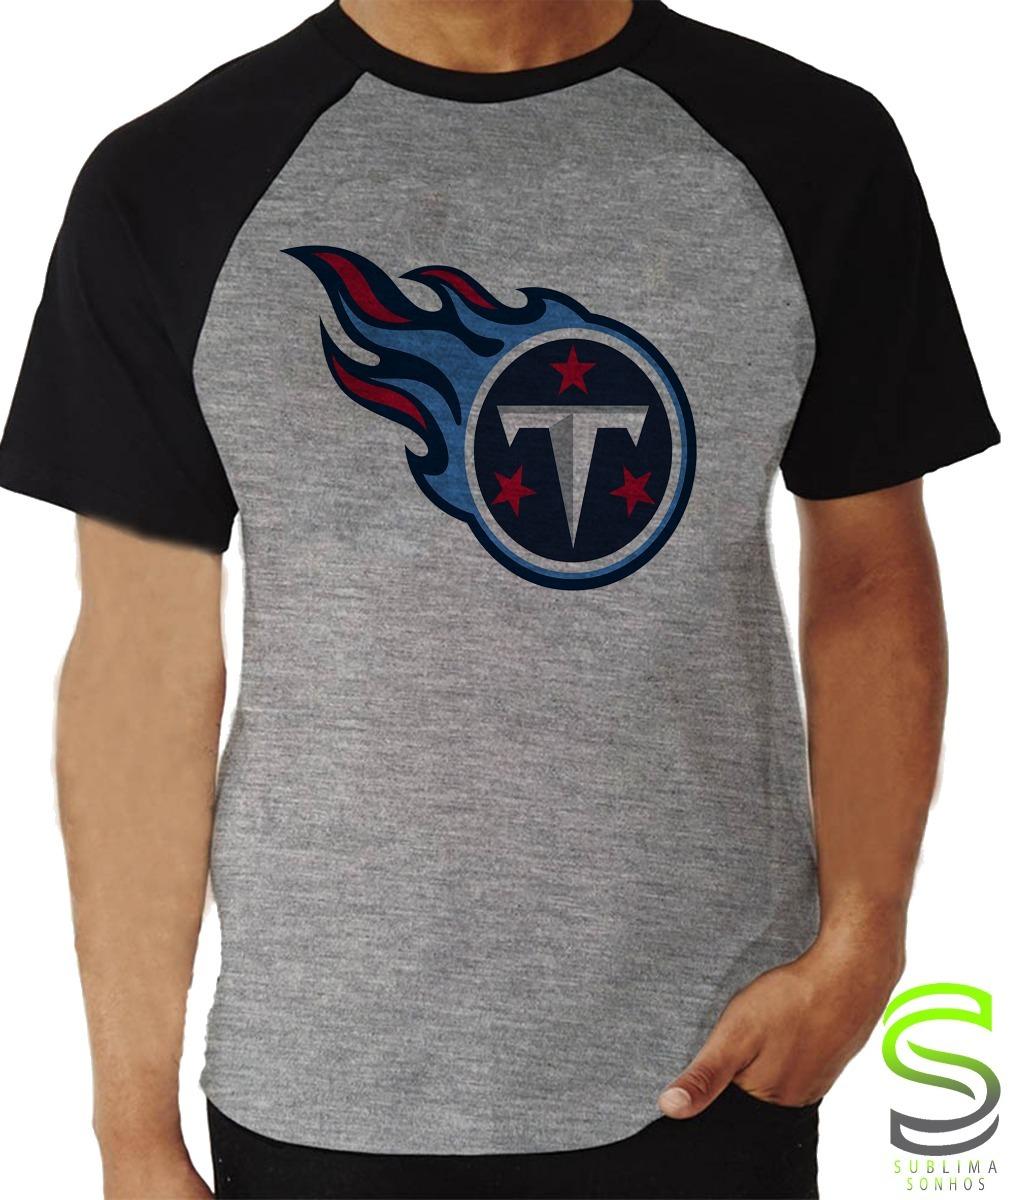 fb74277f4 camisa camiseta tennessee titans nfl raglan cinza mescla. Carregando zoom.